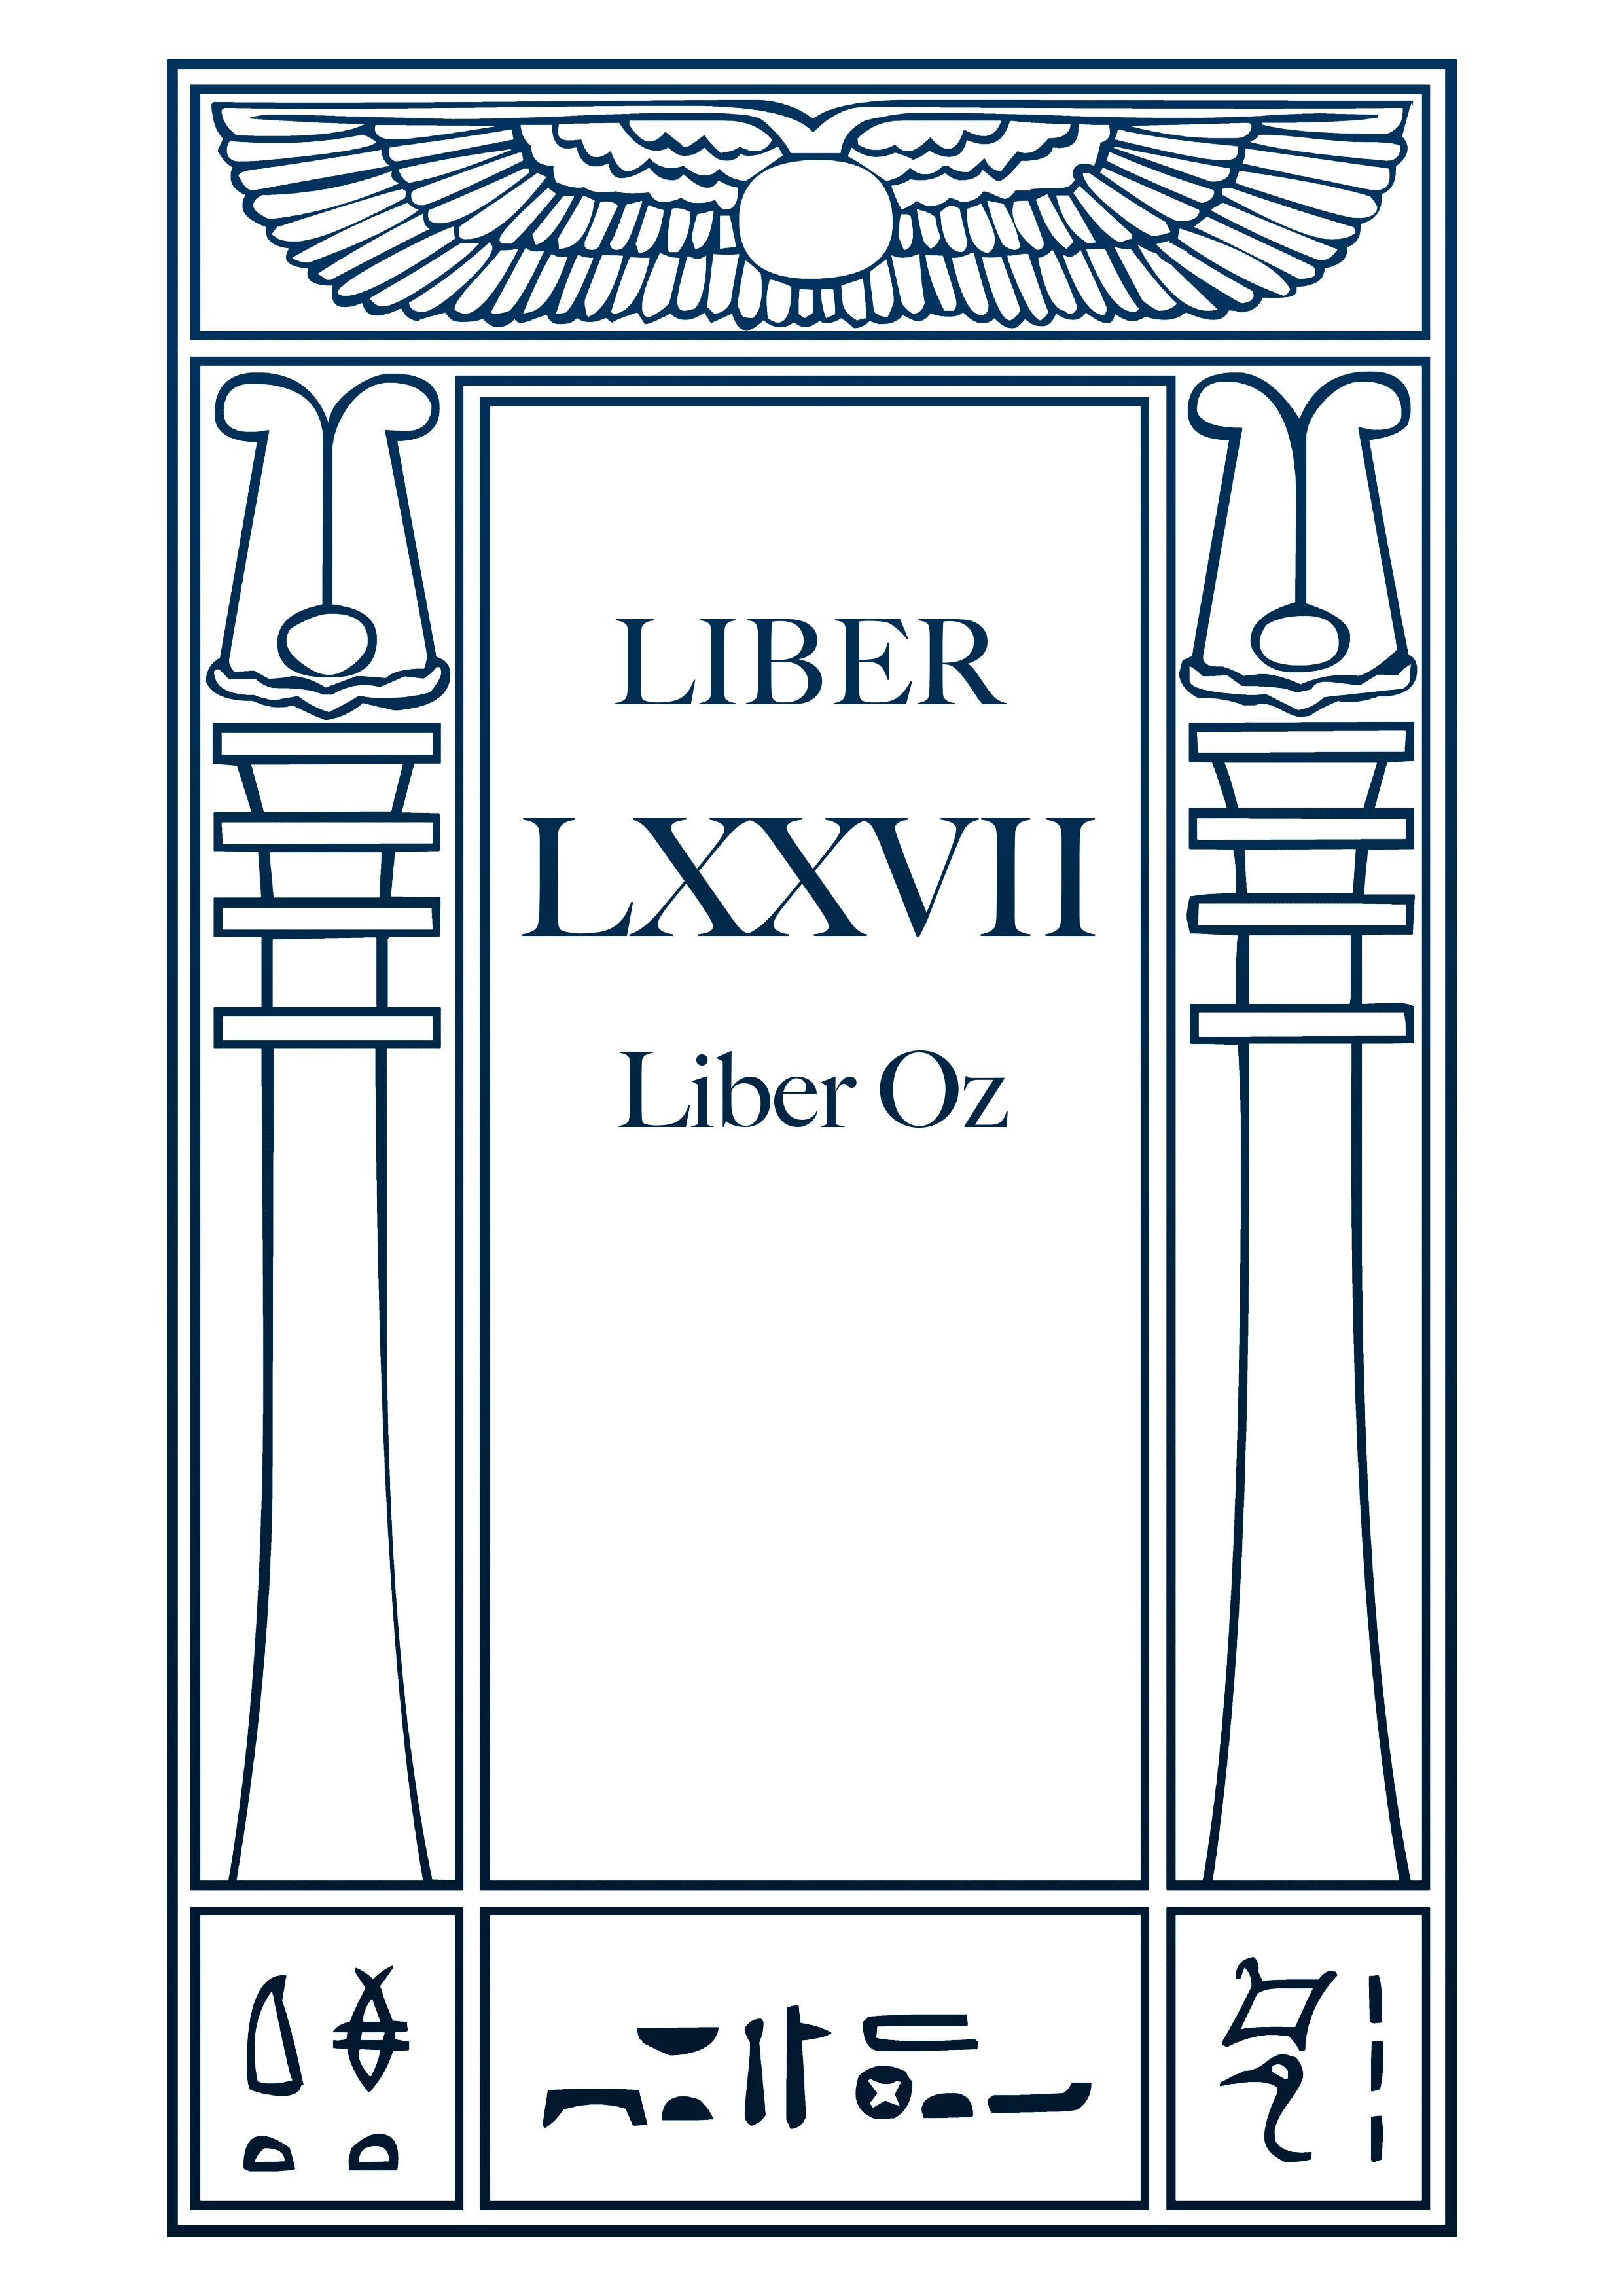 Liber LXXVII